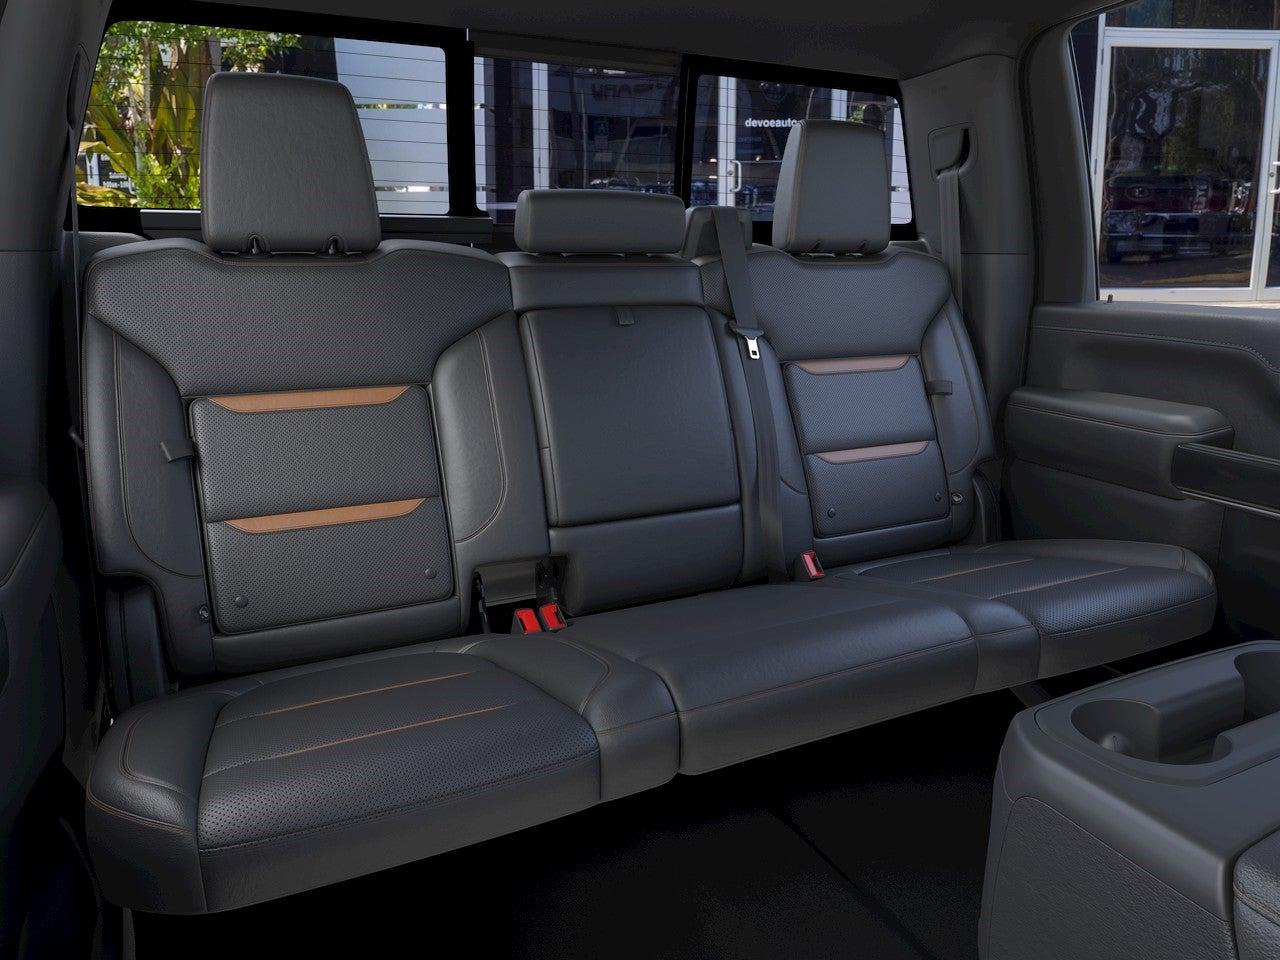 2021 GMC Sierra 2500 Crew Cab 4x4, Pickup #T21289 - photo 14